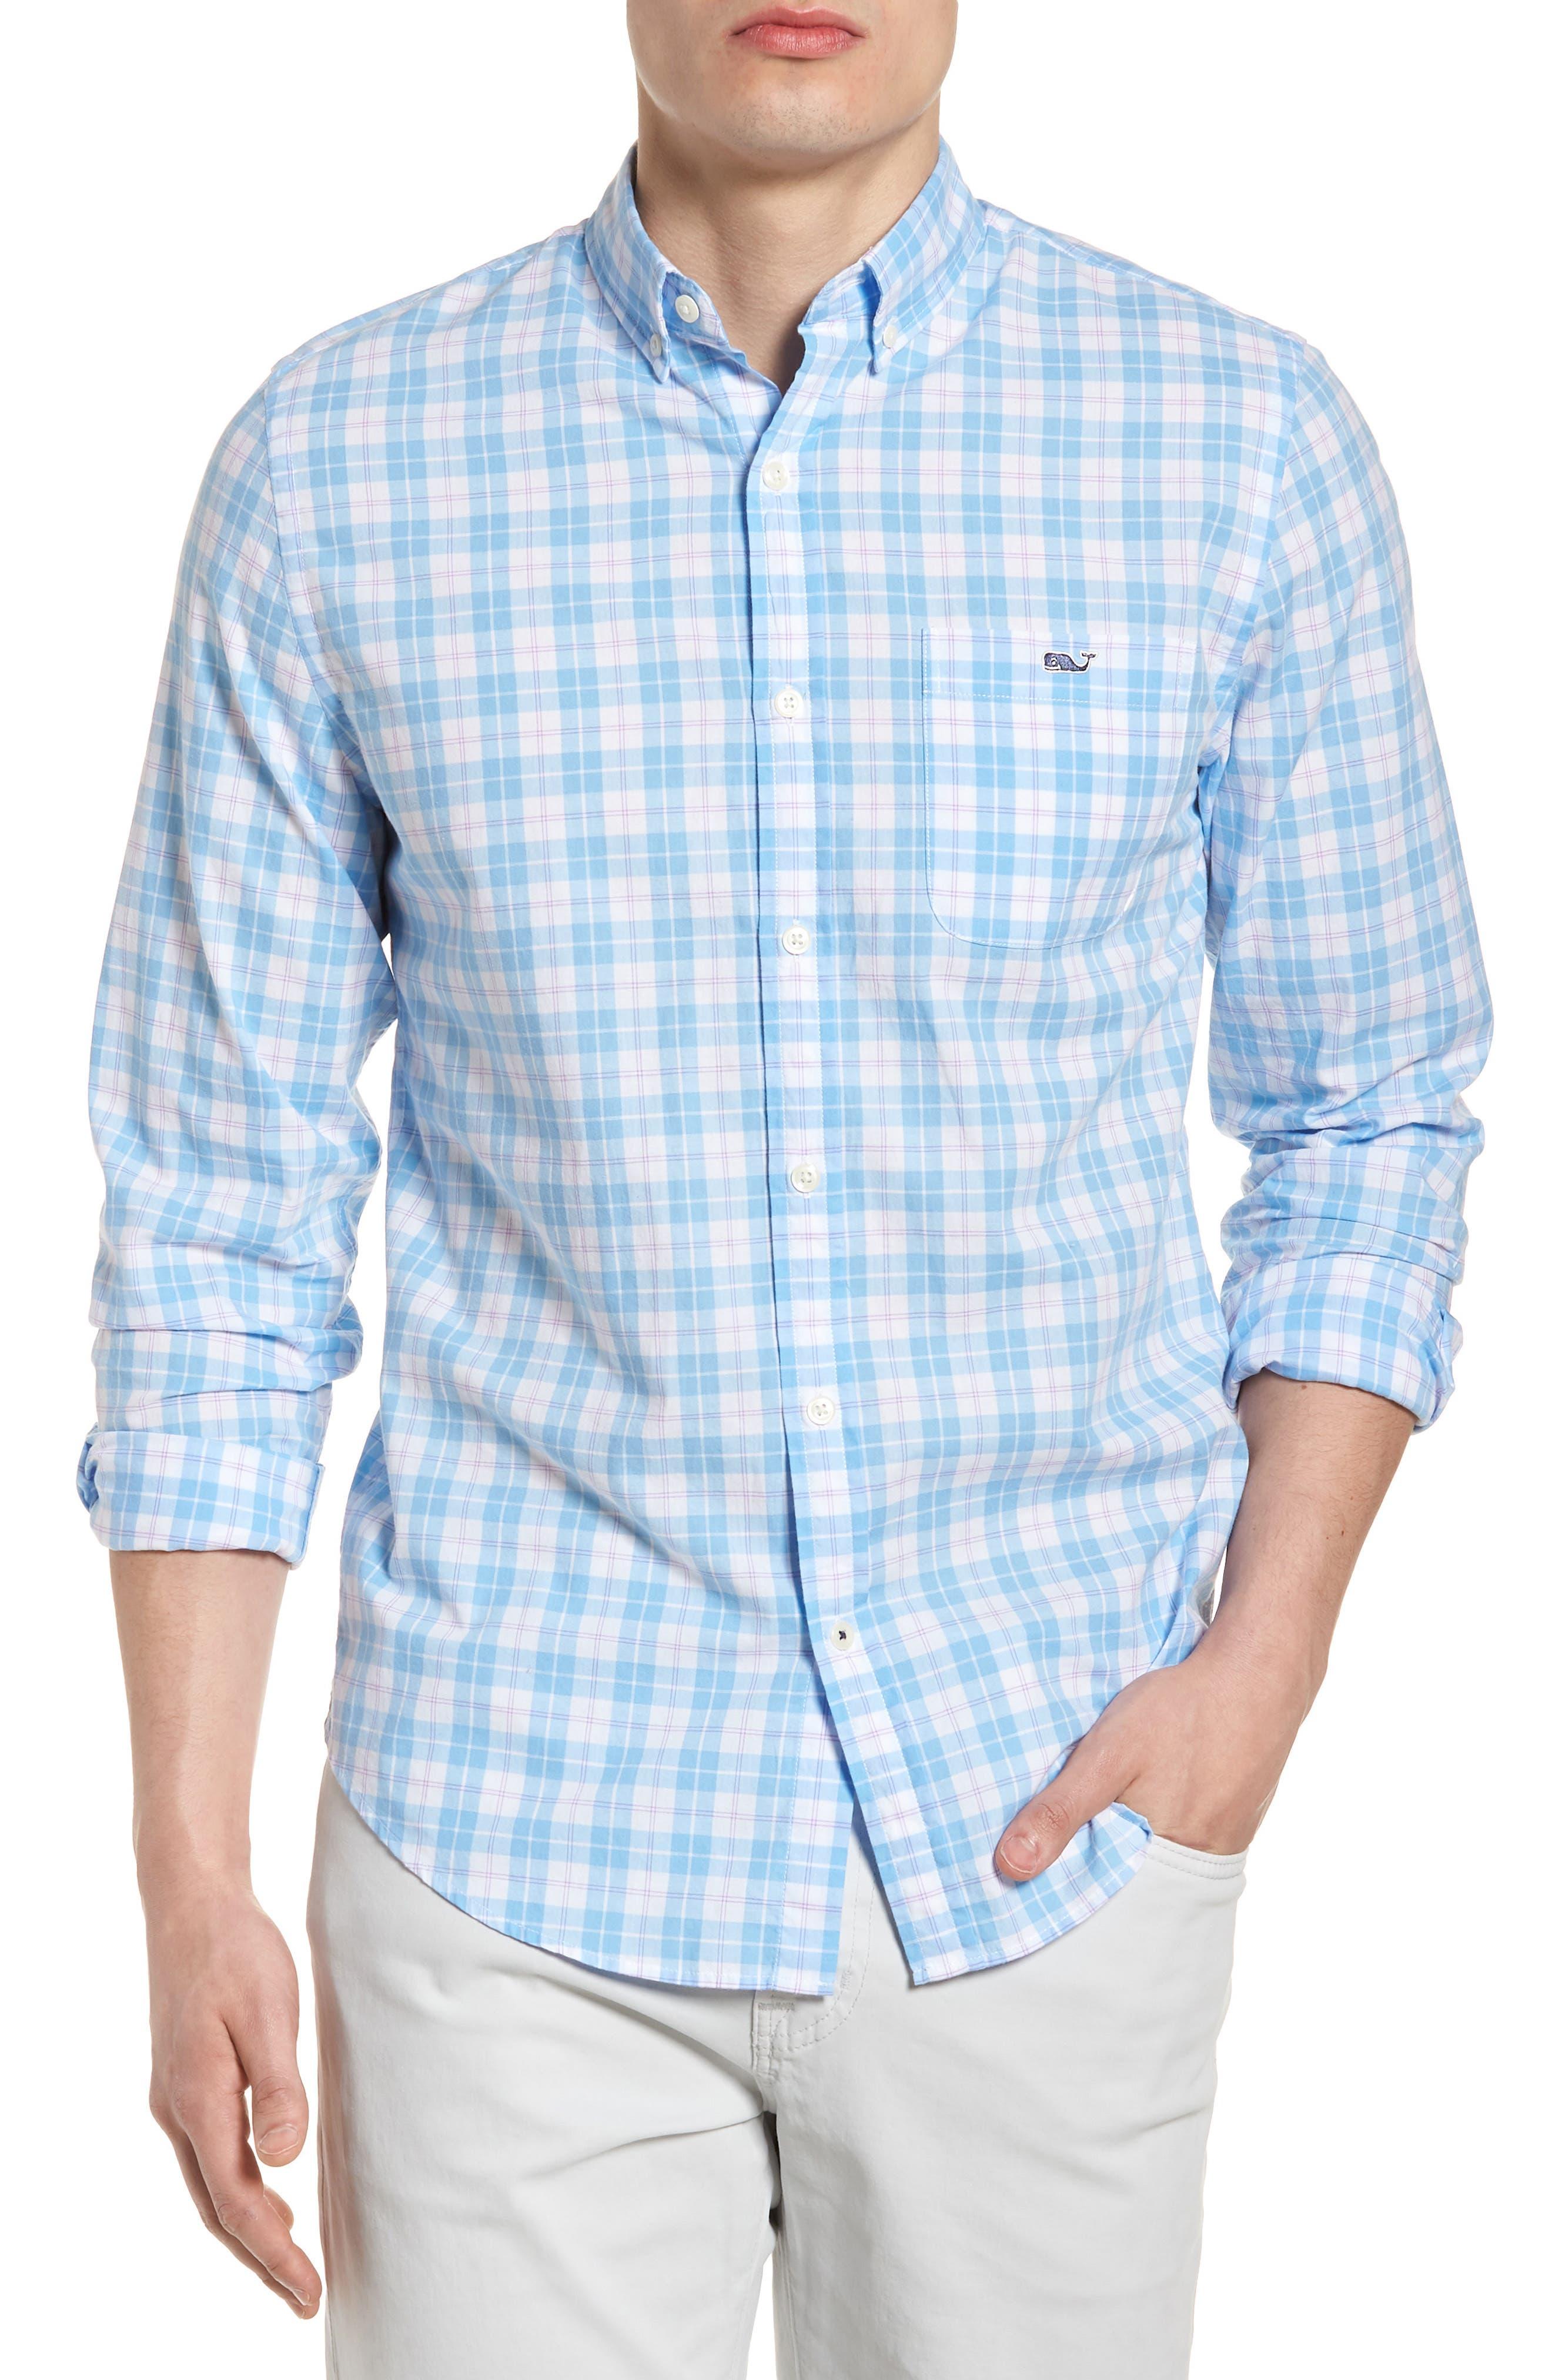 Shallow Sea Slim Fit Plaid Sport Shirt,                         Main,                         color, Ocean Breeze